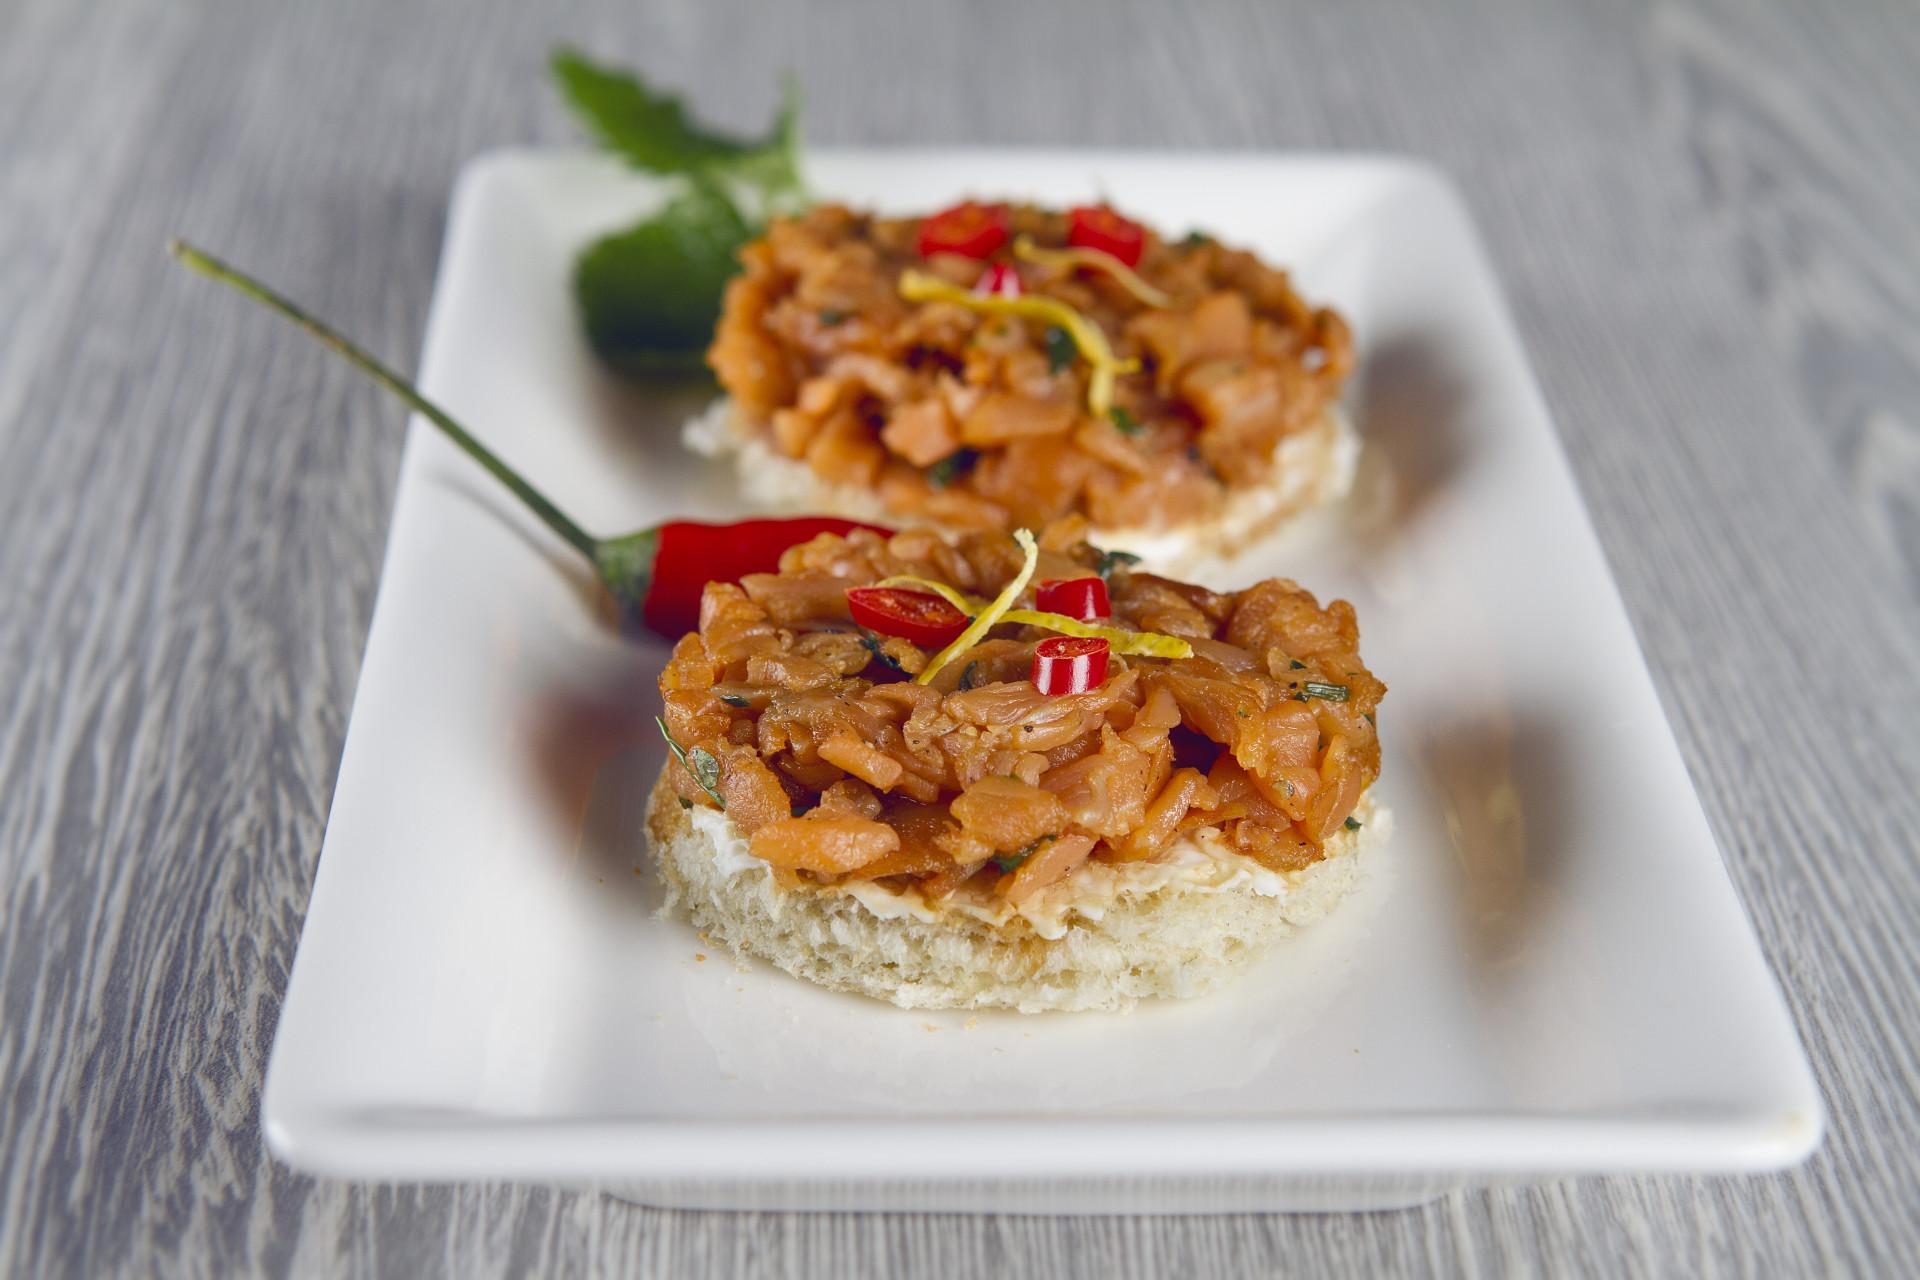 Savoury tartar- salmon and chives